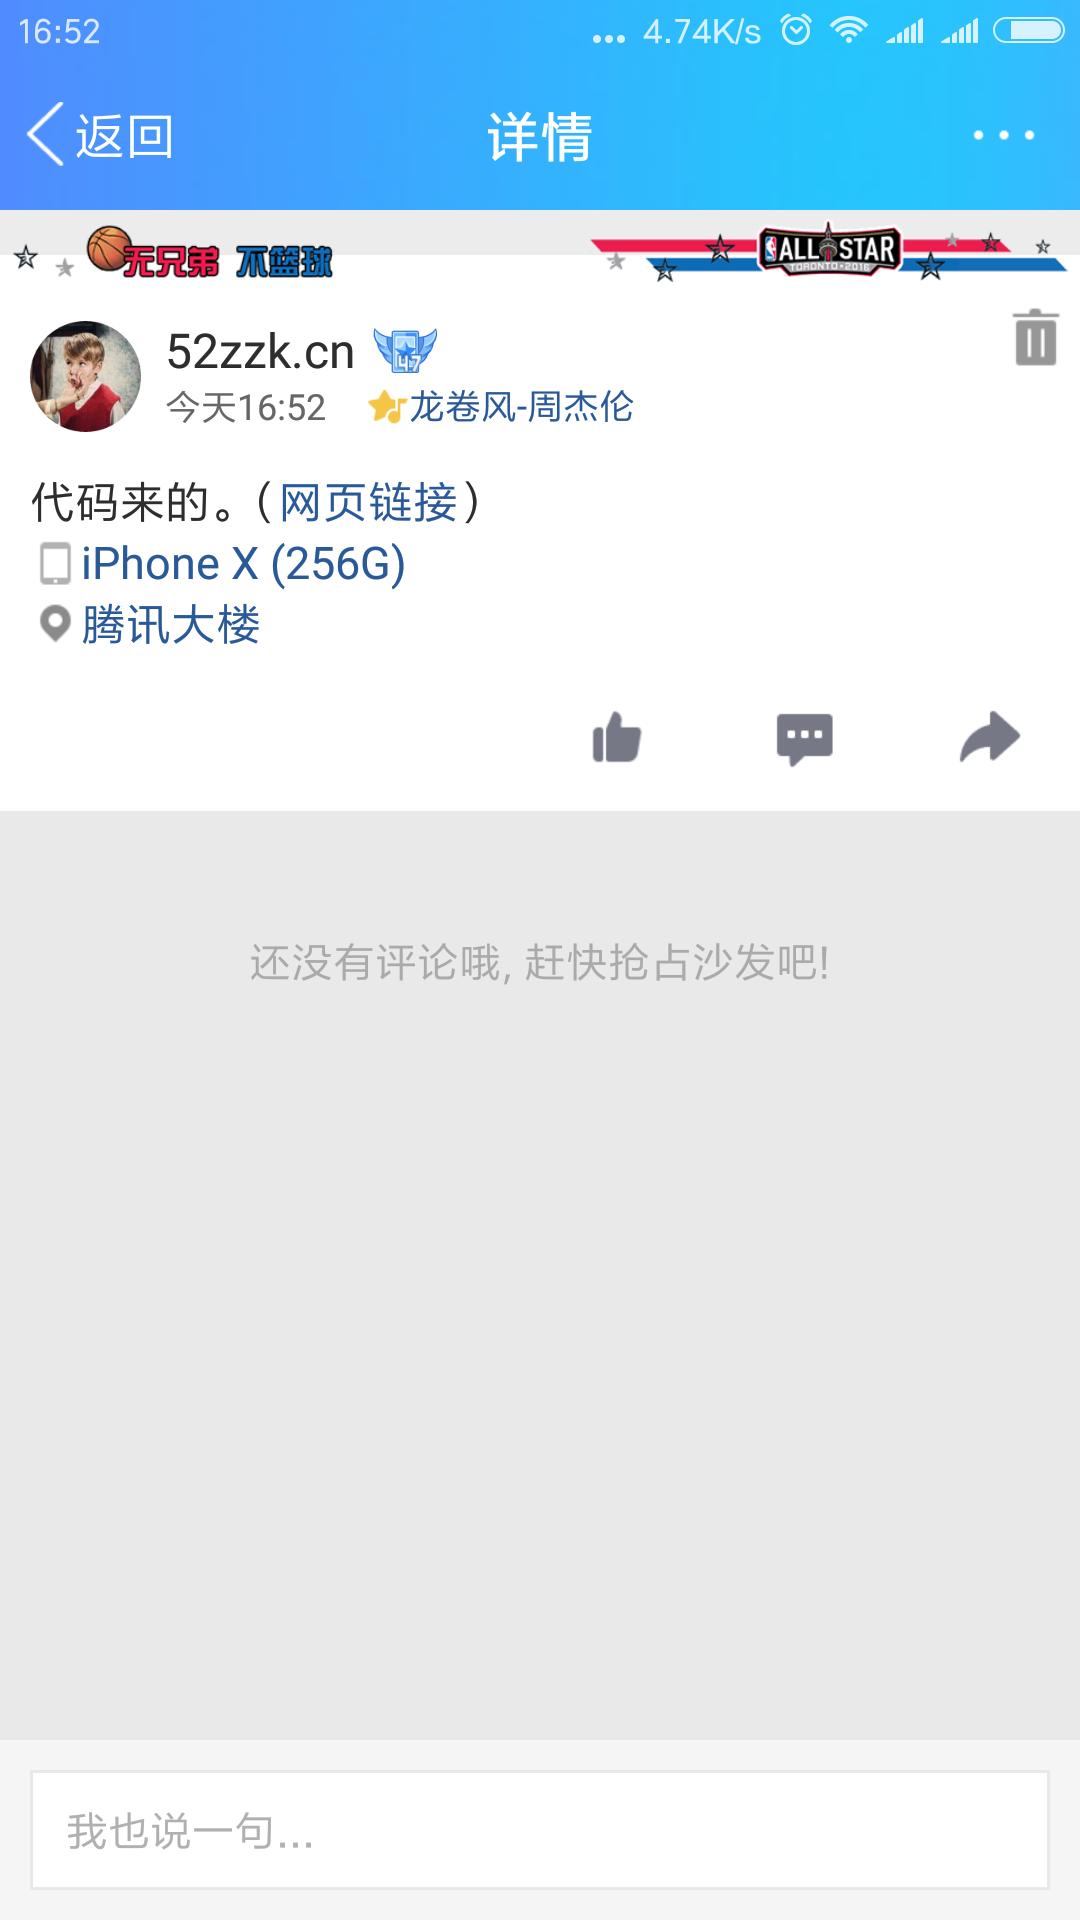 Screenshot_2017-09-24-16-52-25-909_com.tencent.mobileqq.png